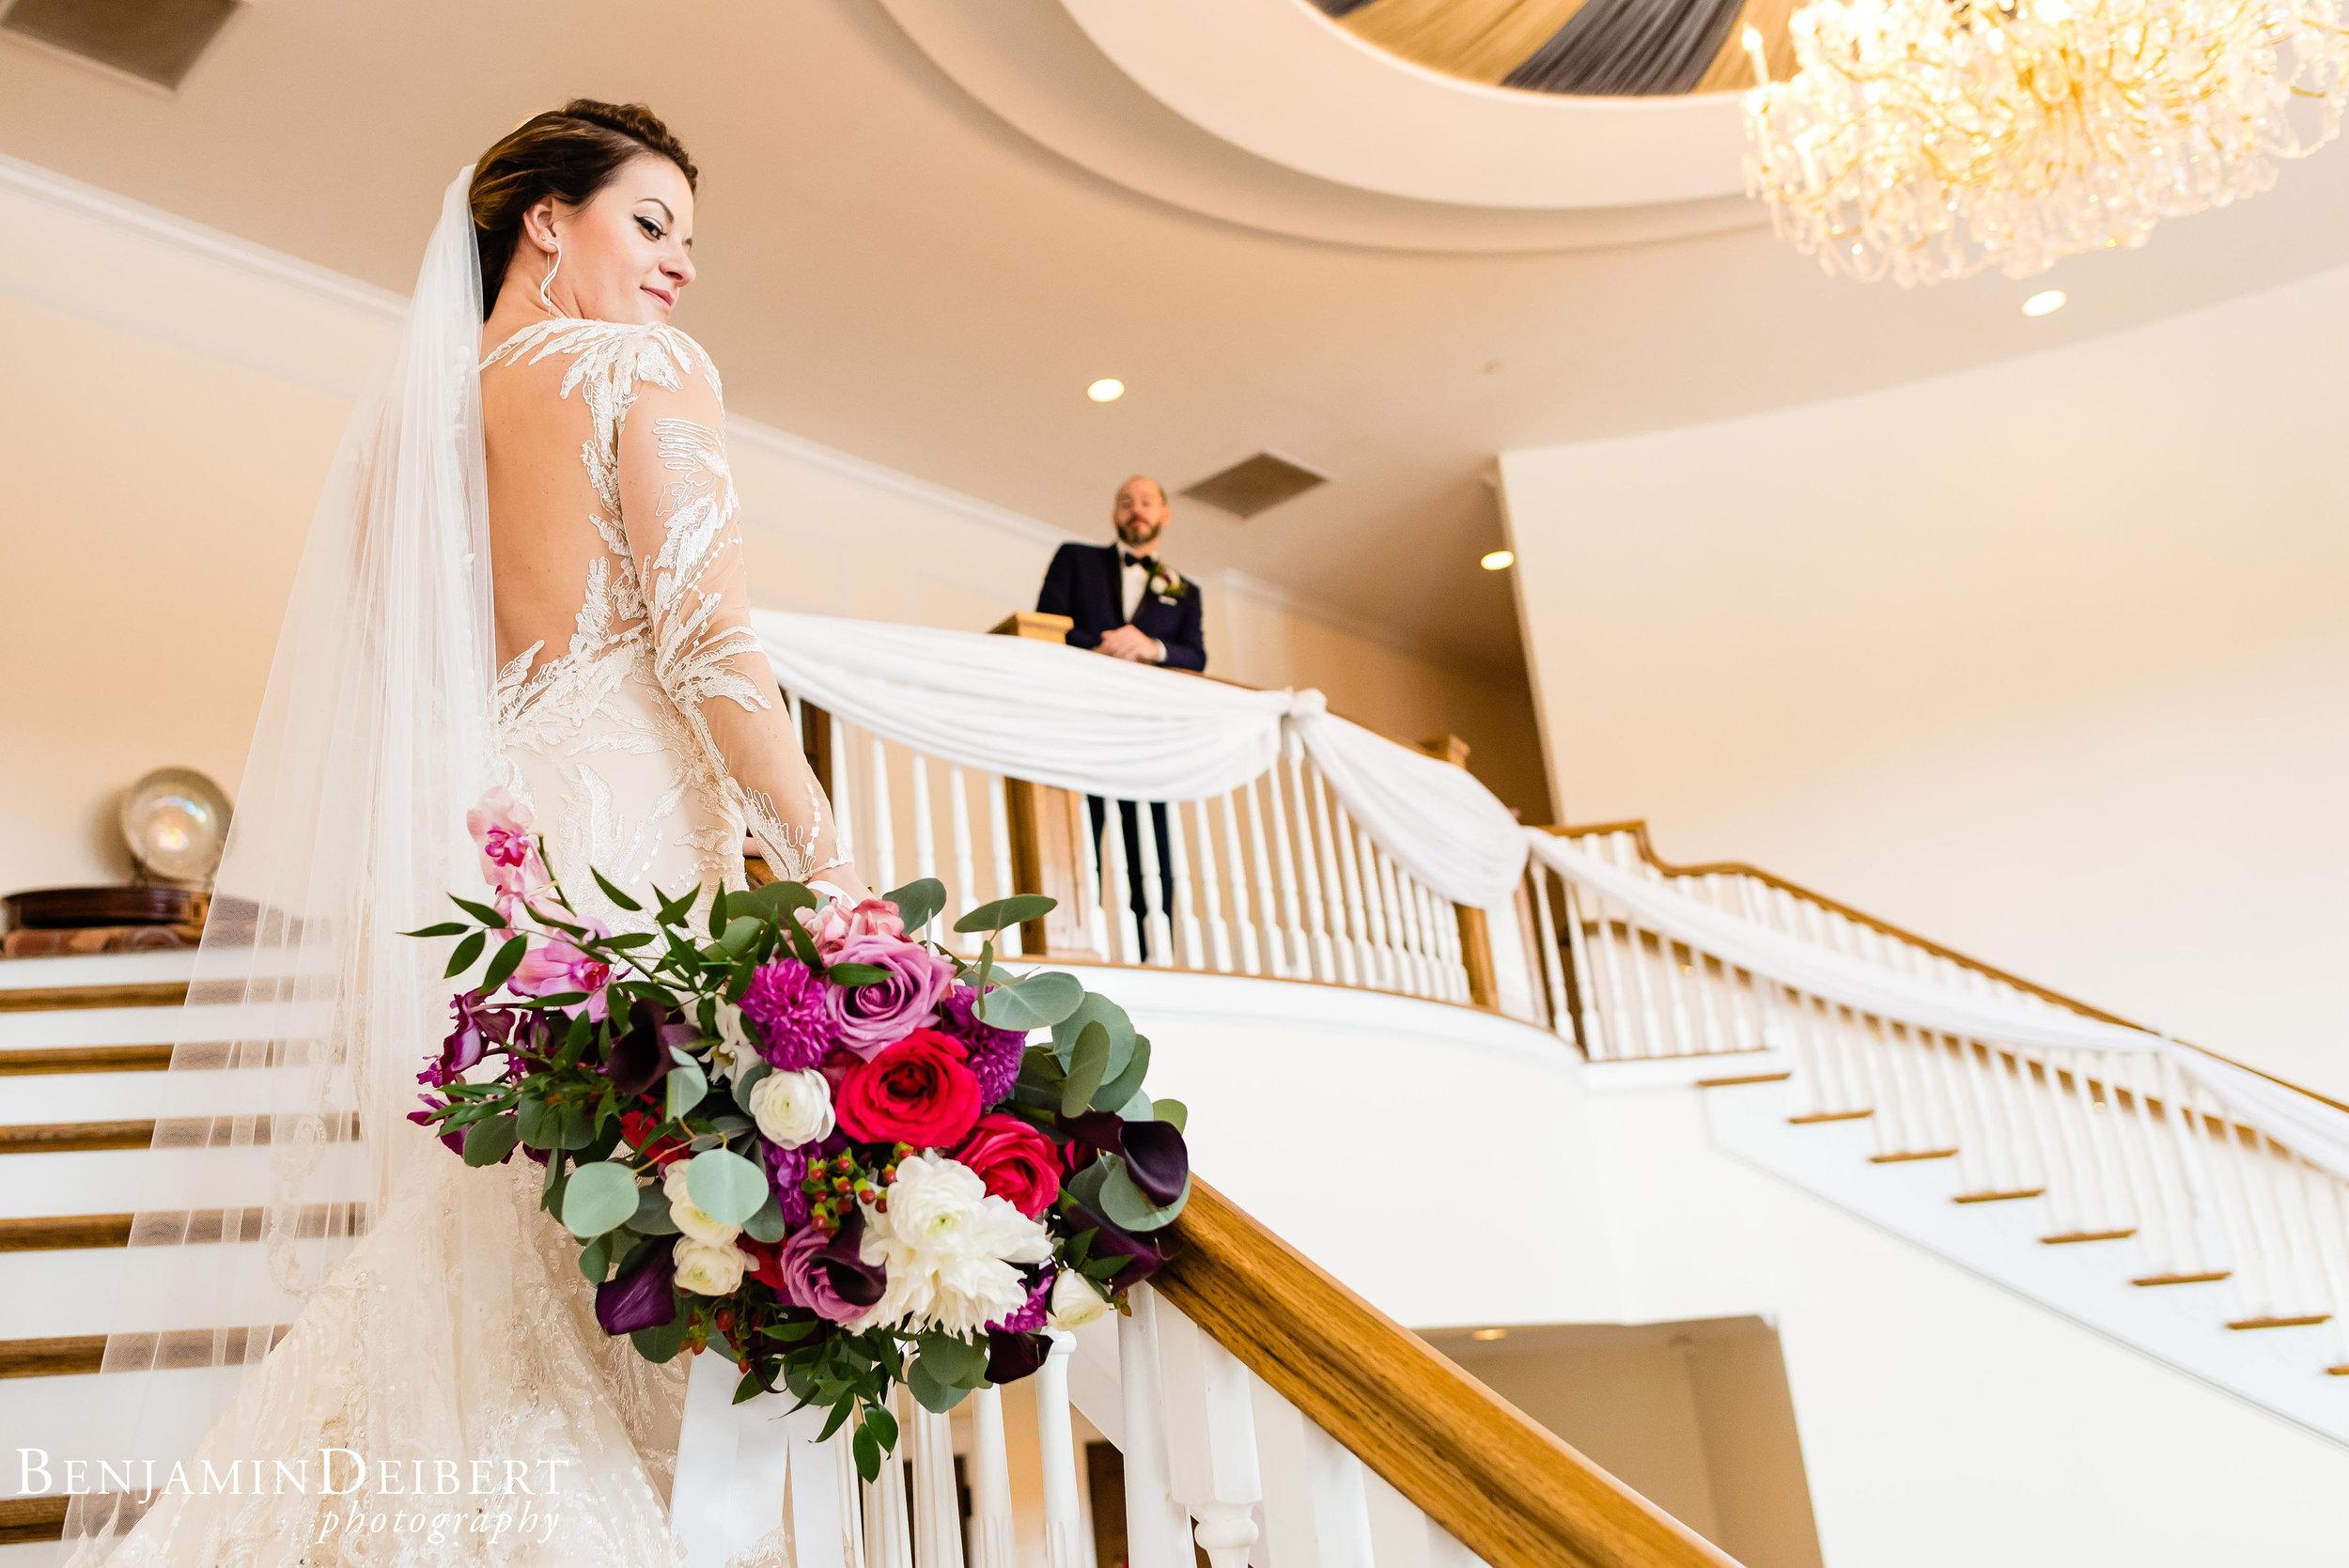 AmandaandElliott_TheCarriageHouse_Wedding-25.jpg